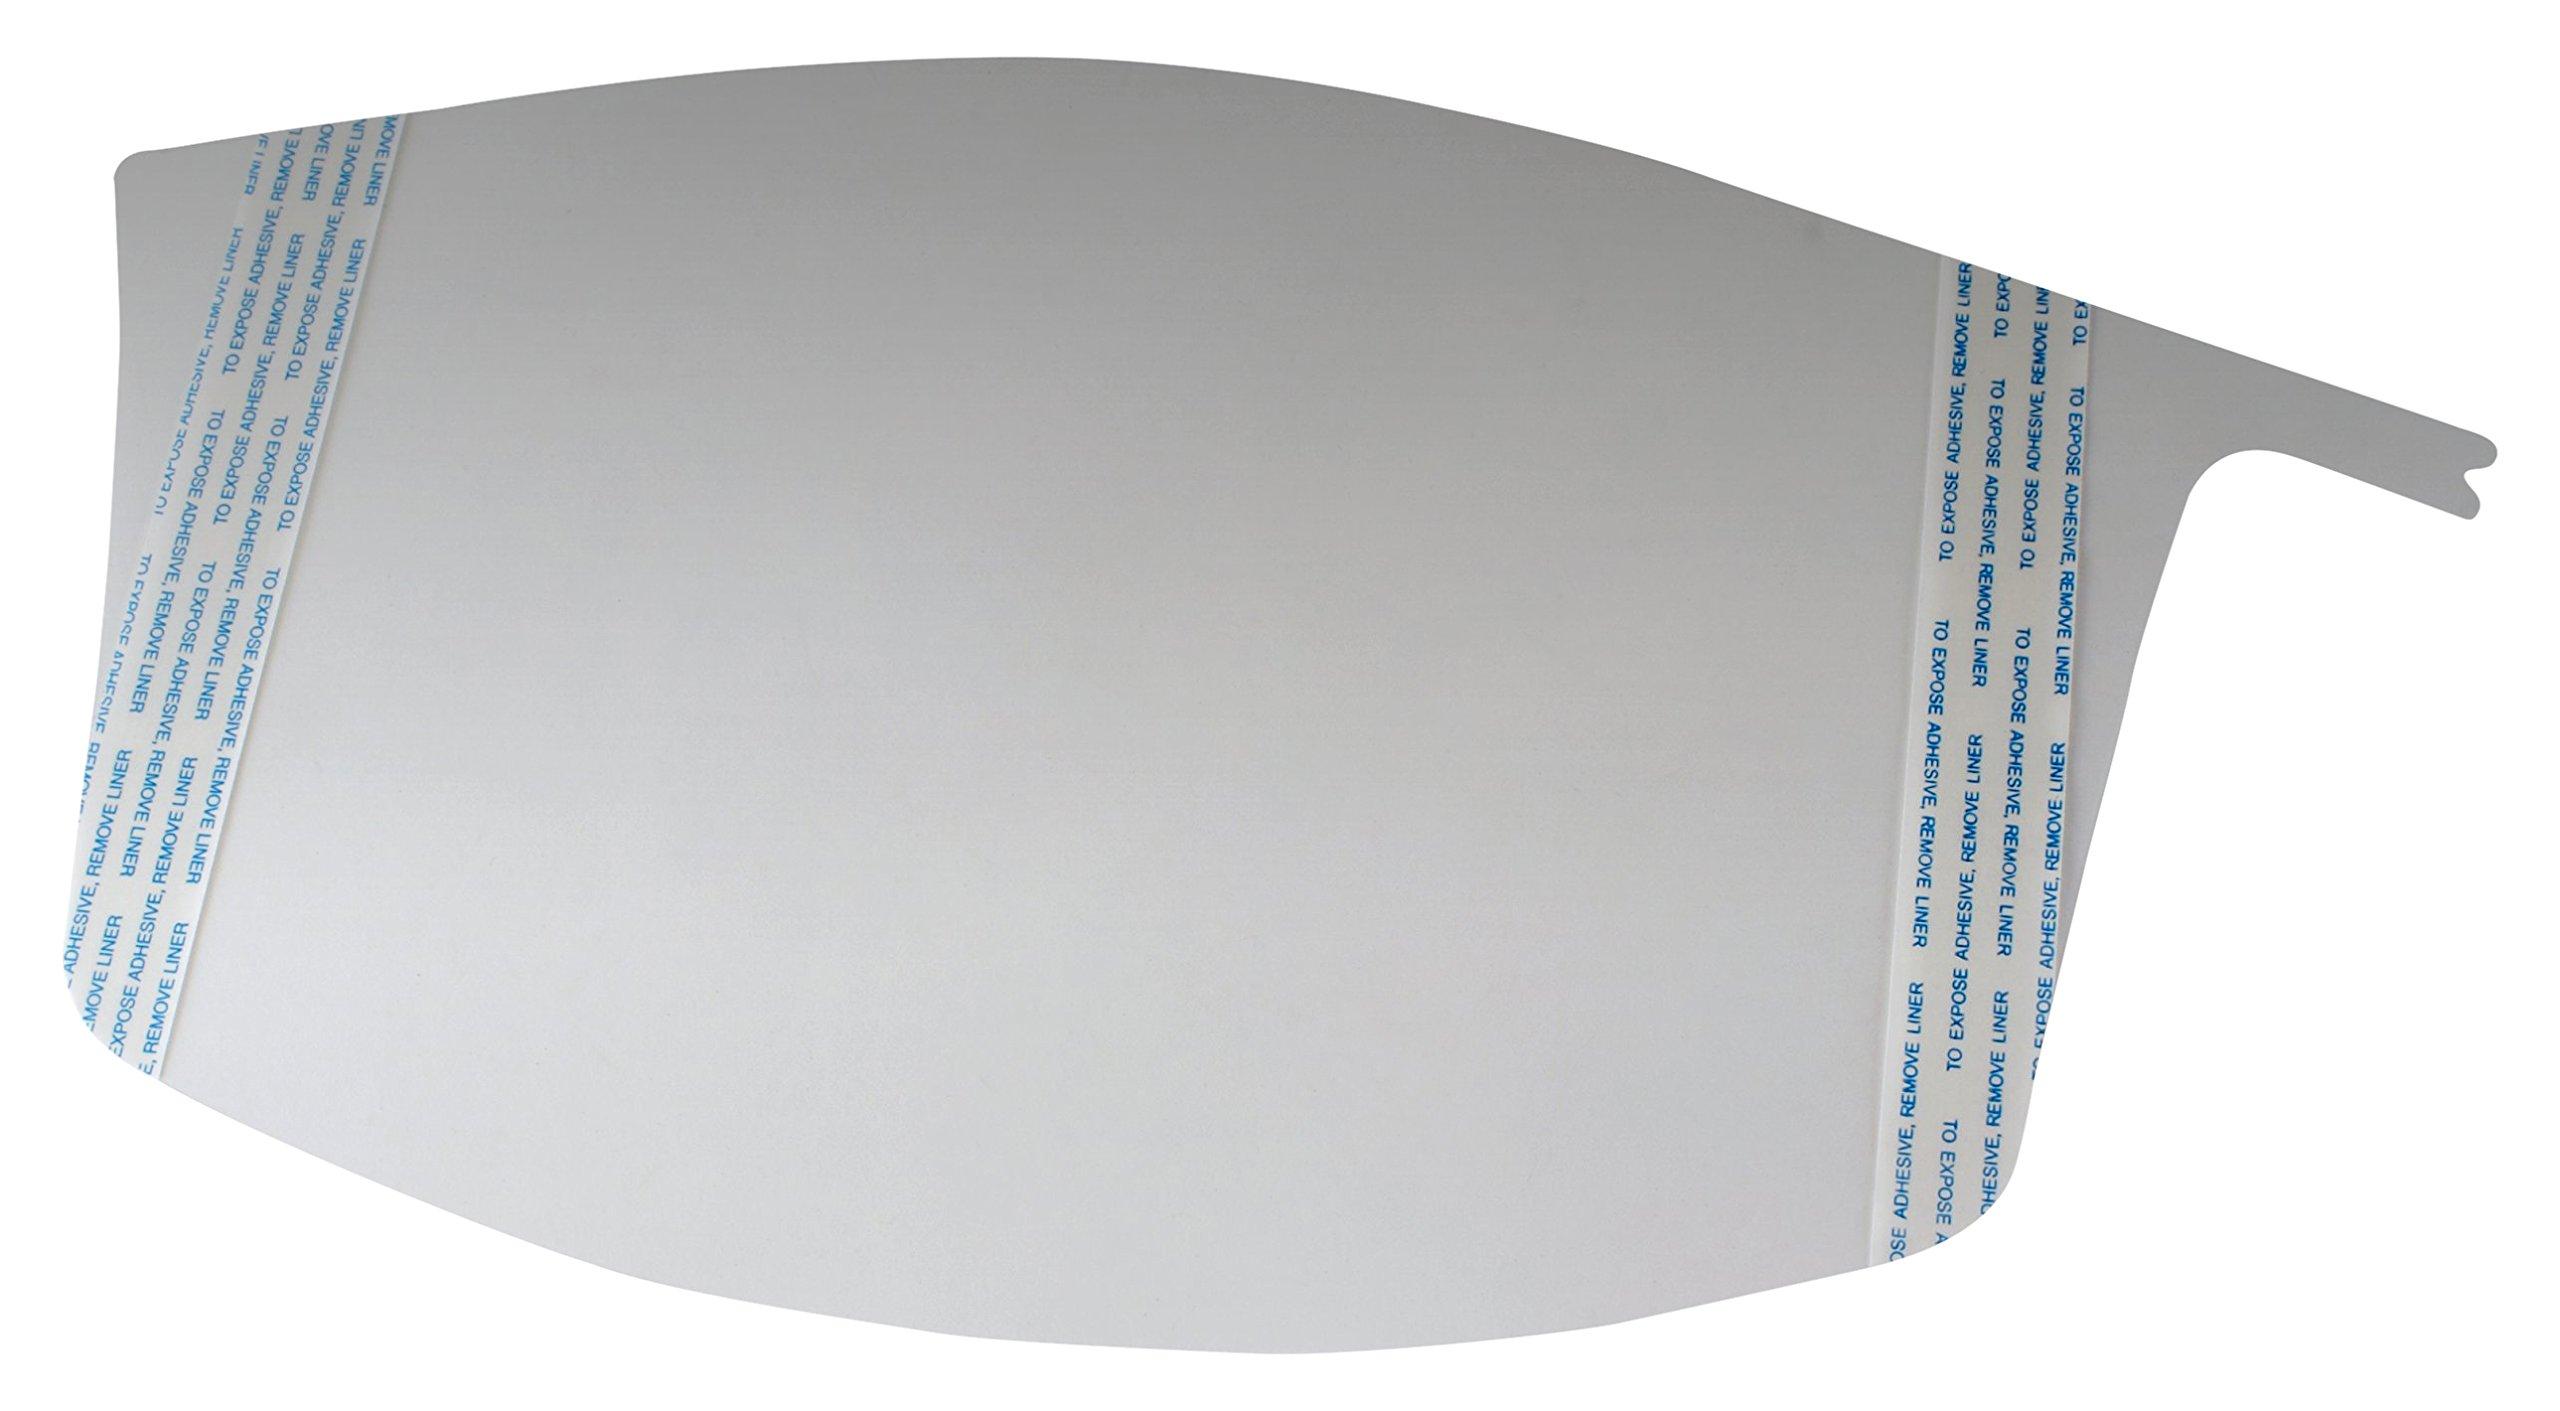 3M Versaflo 37322-case Peel-Off Visor Covers M-926/37322(AAD), for M-925 Standard Visor, 40 EA/Case, Clear (Pack of 40) by 3M